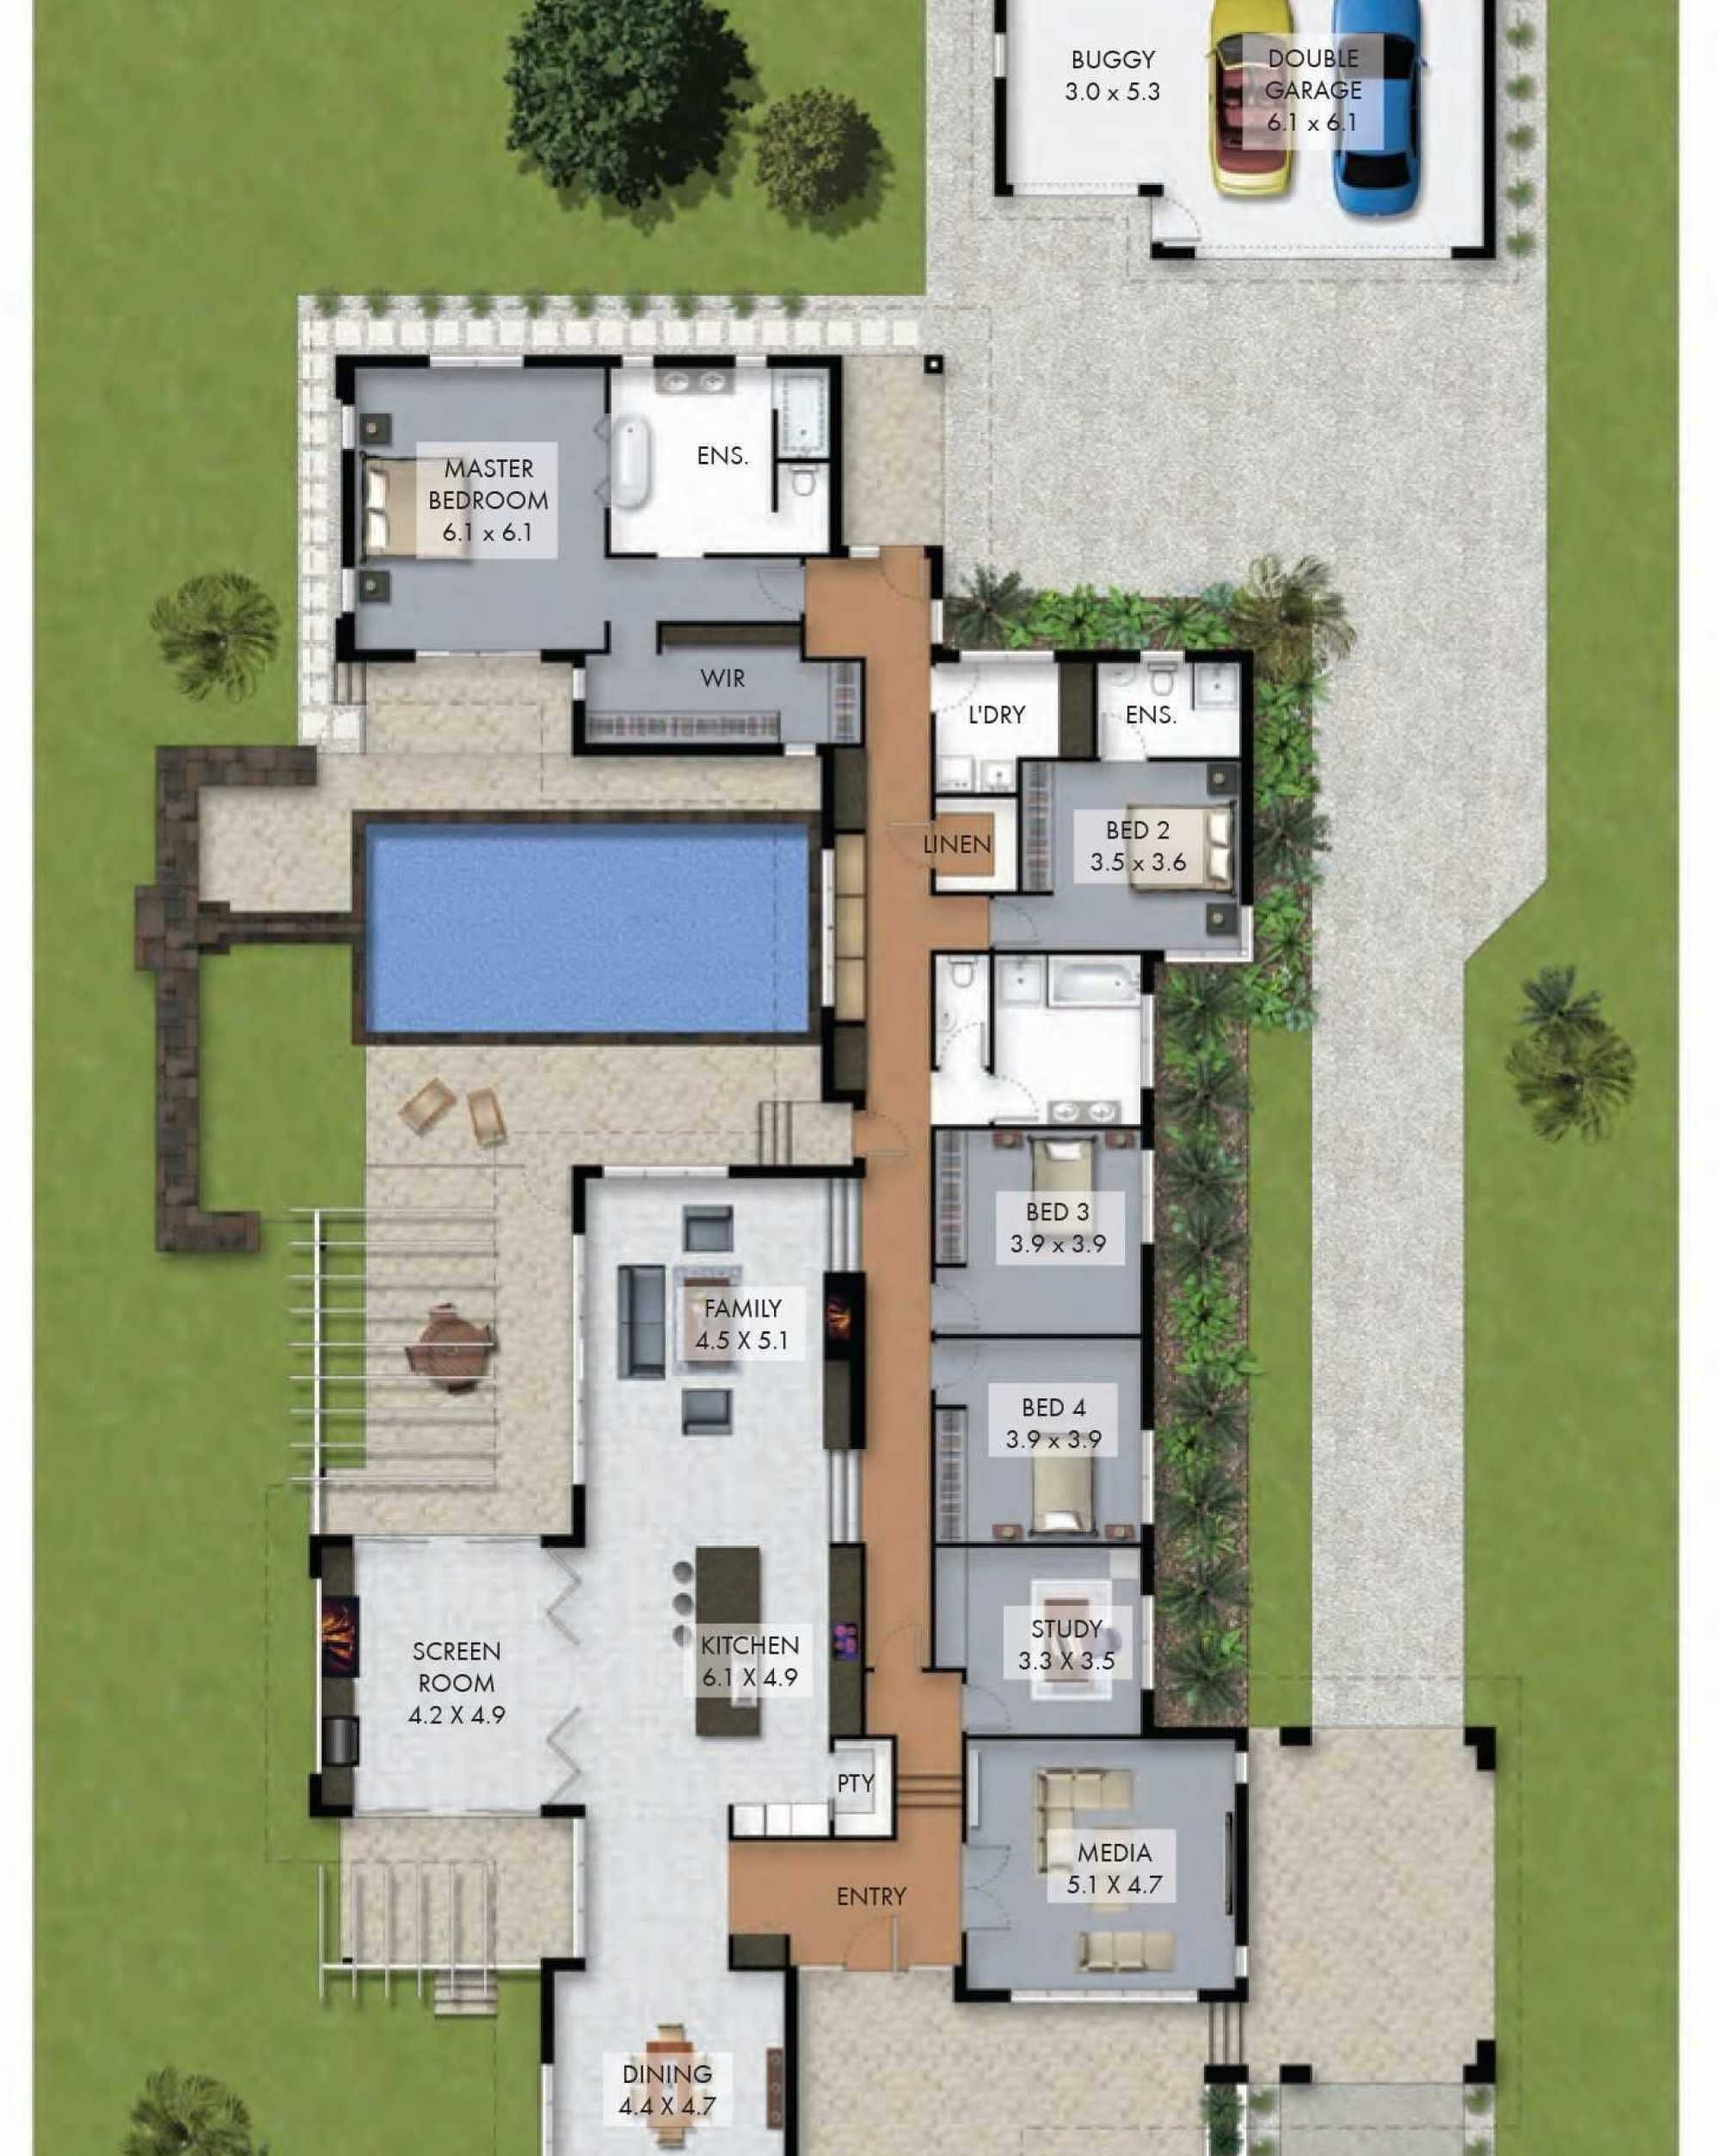 House Plans For Triangular Lots Fresh Unique Home Planner Image Home House Plans For Triangle Lots Plantas De Casa Container Plano De Casa Piso Residencial